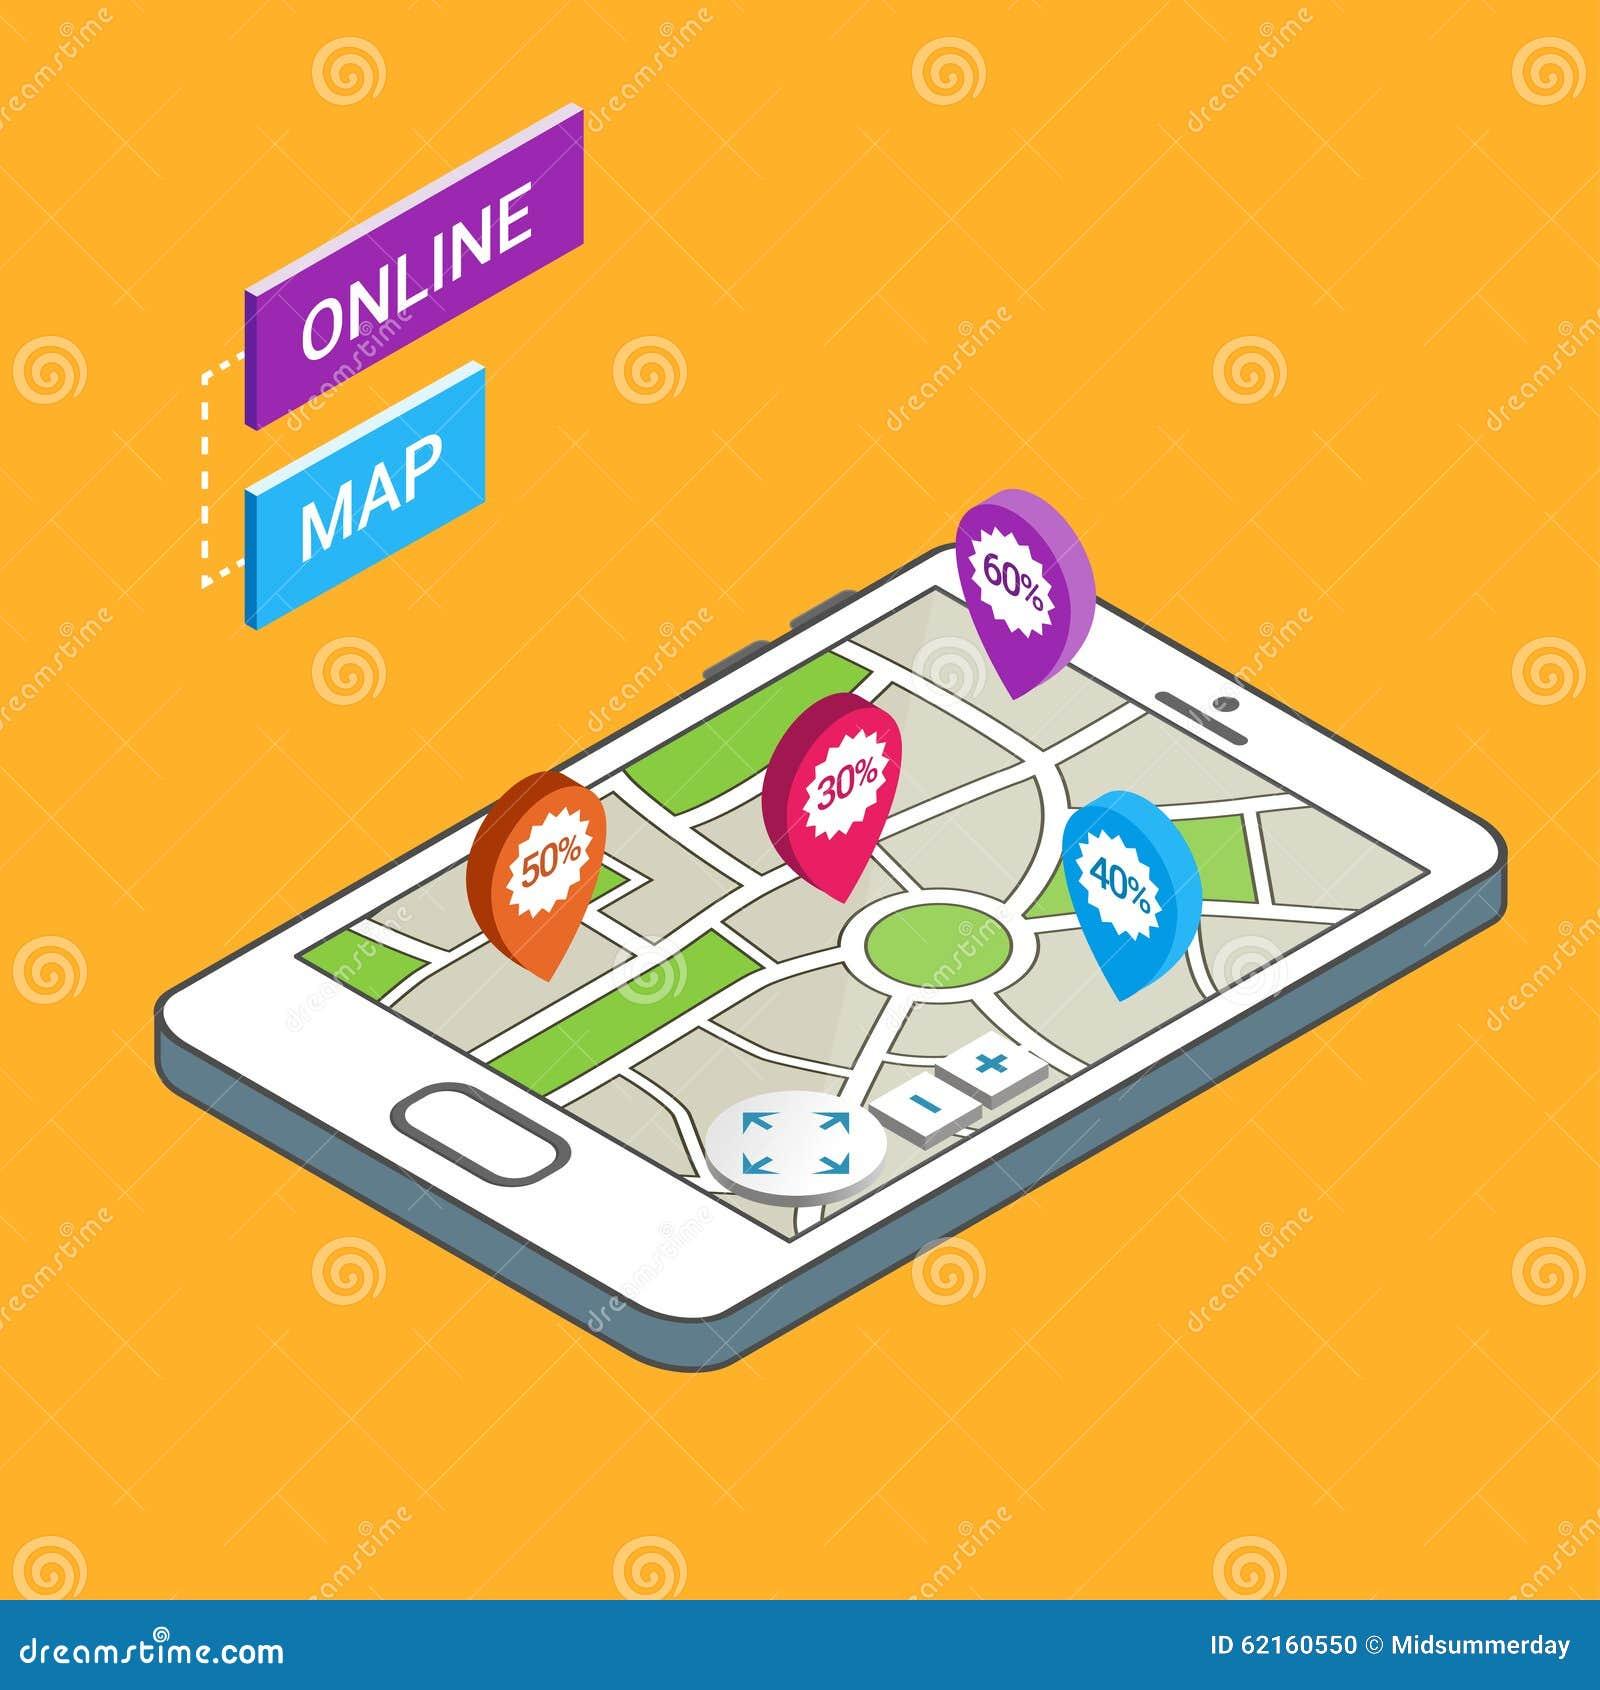 D Smartphone With City Map Online Map Mobile Navigation App - Navigation map online